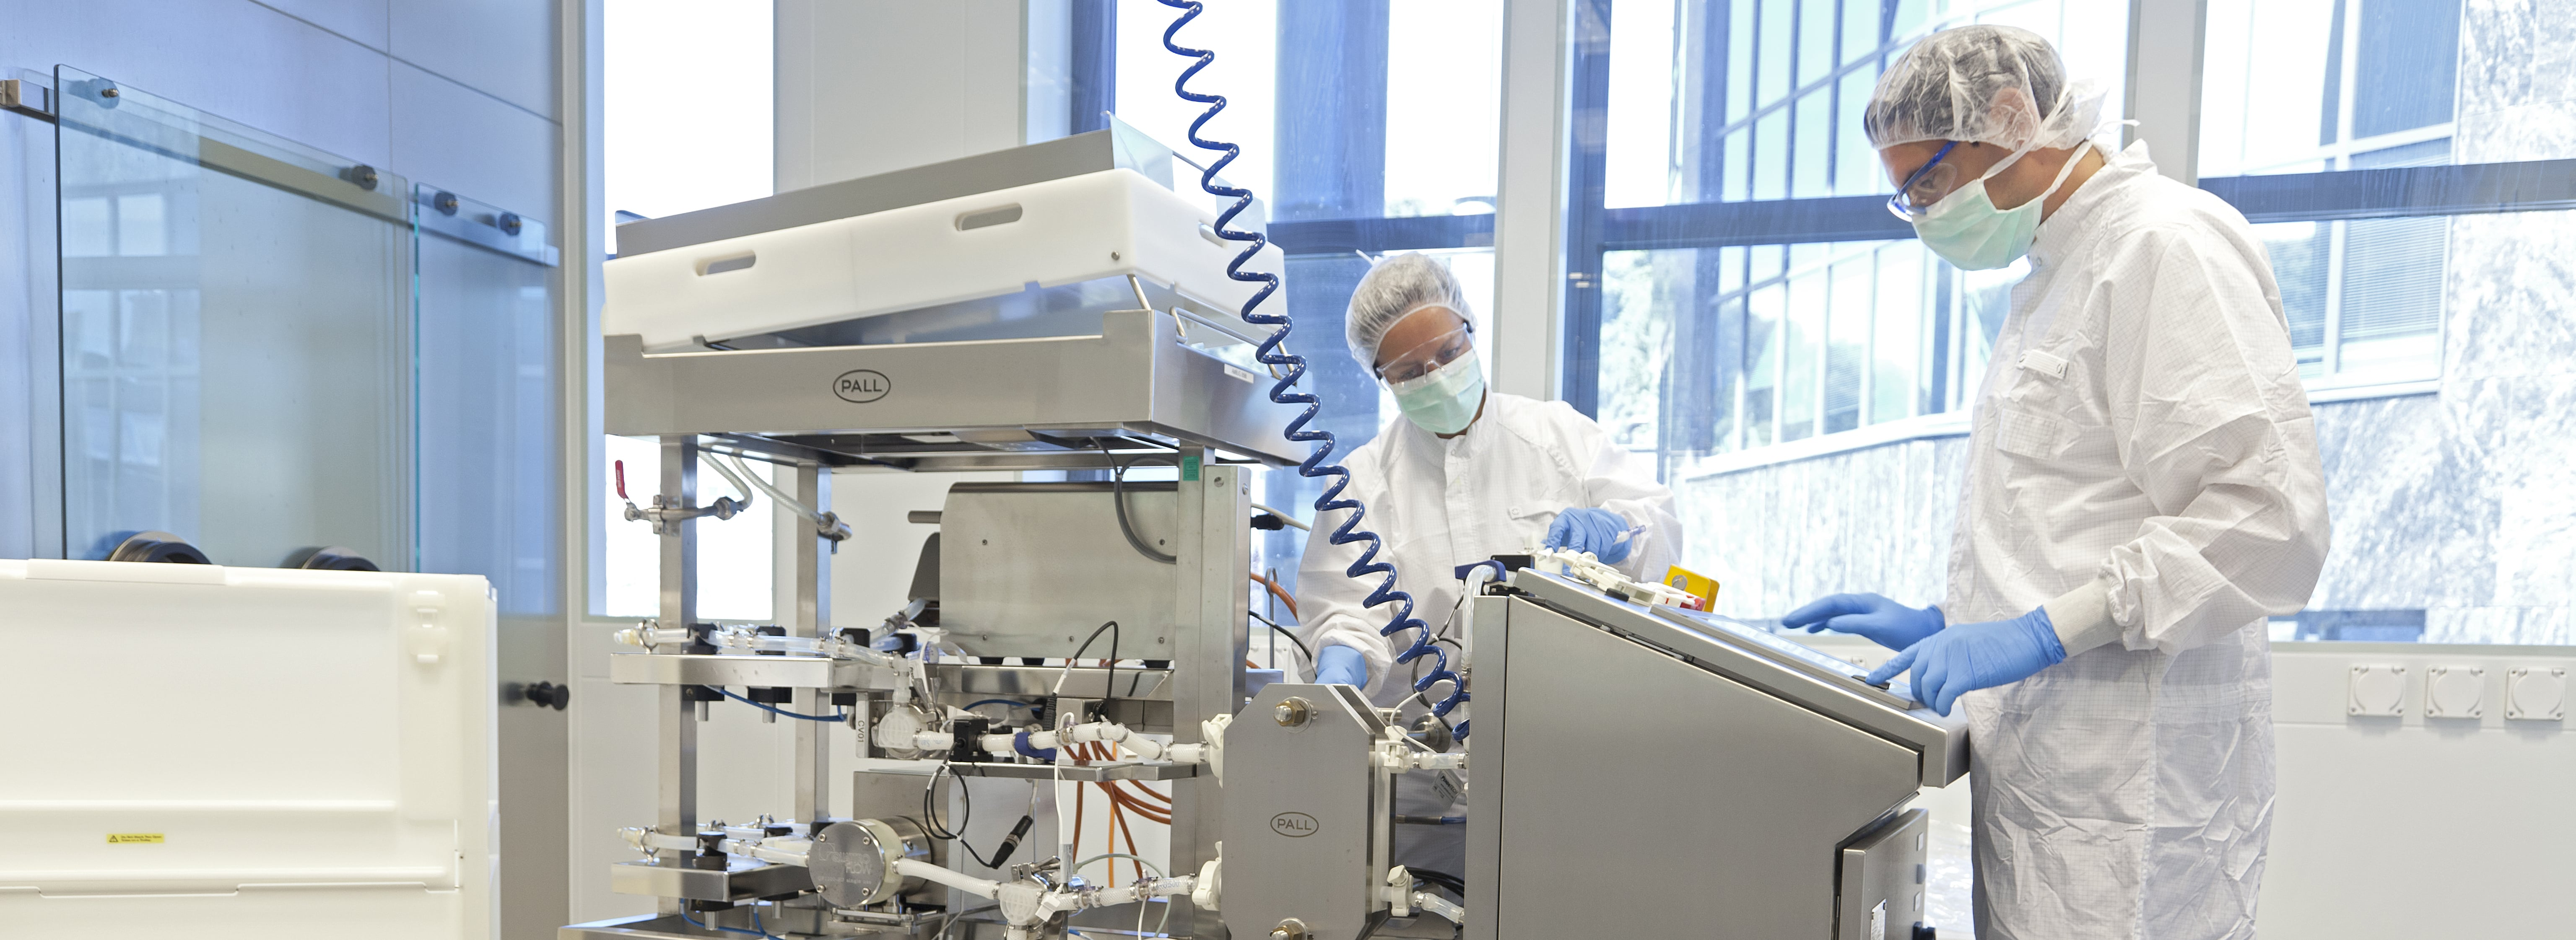 Antibody Drug Conjugates and Bioconjugation made in Bubendorf